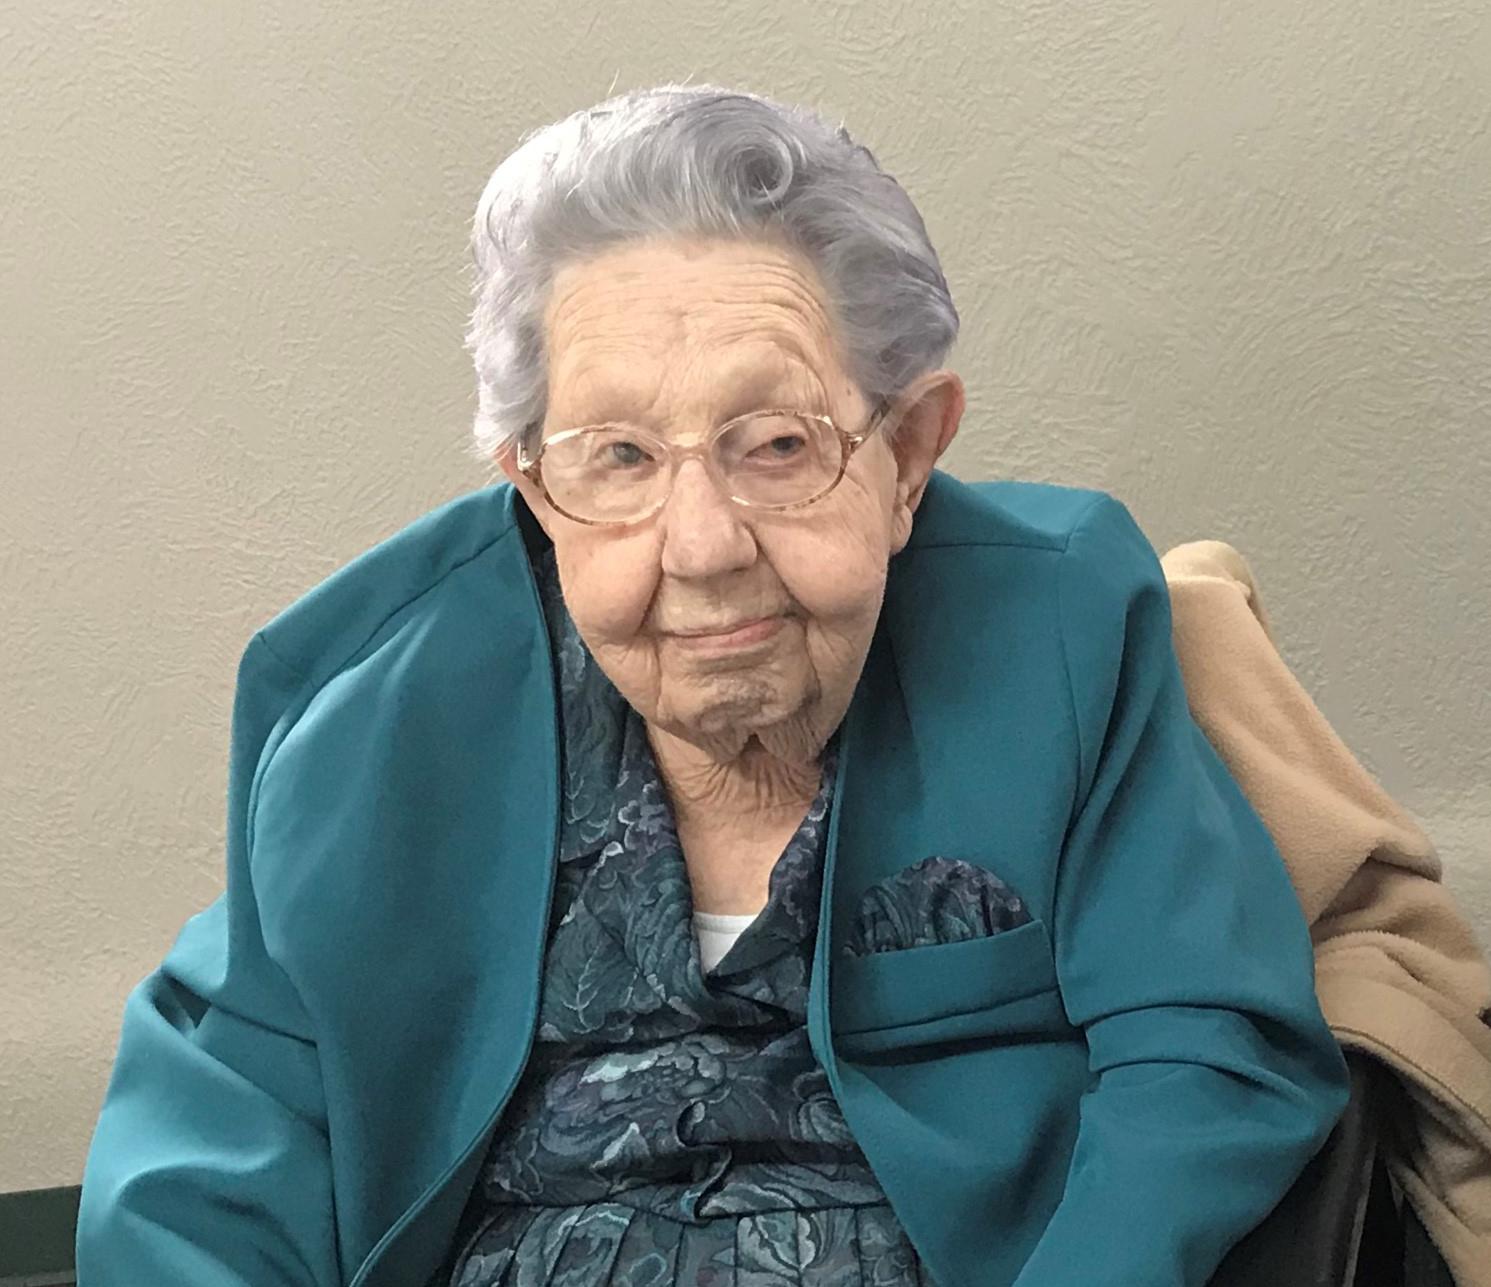 Berniece Rhinehart, age 100, of Arapahoe